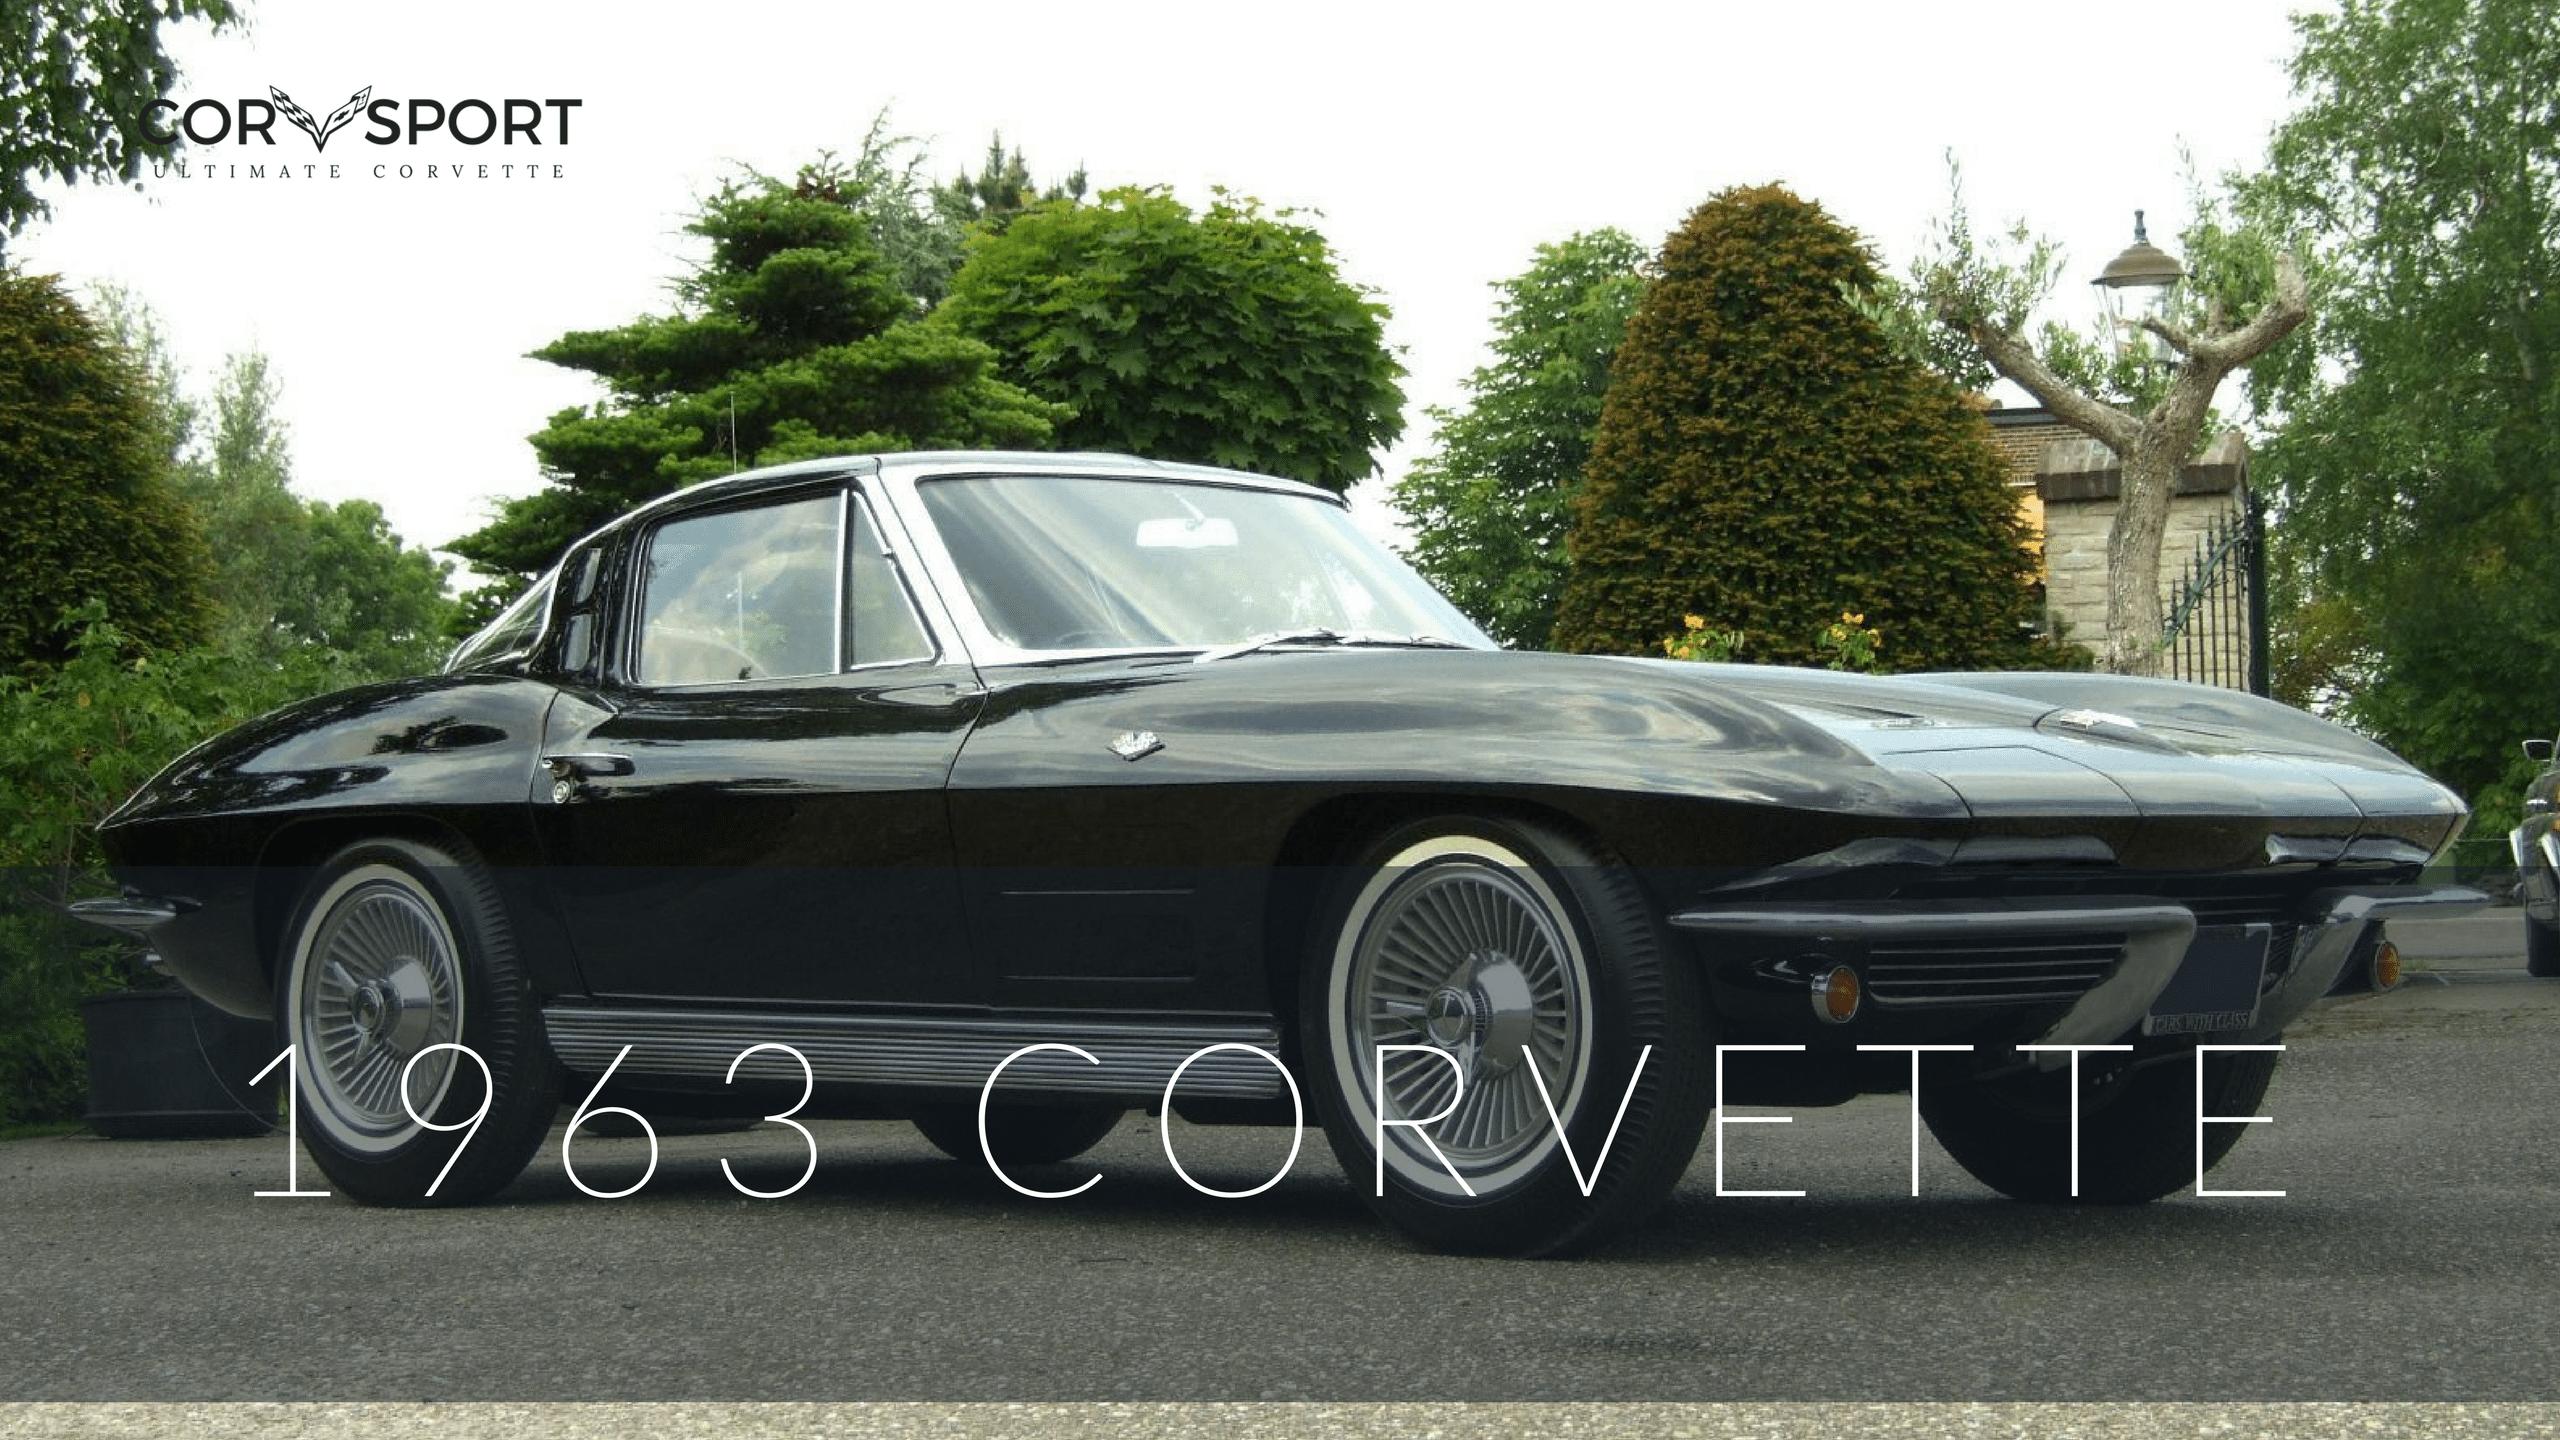 CO_1104] 64 Chevy Corvette 327 Wiring Diagram Schematic WiringUnnu Ophen Ponol Ostr Aeocy Lline Sianu Semec Mohammedshrine Librar Wiring  101